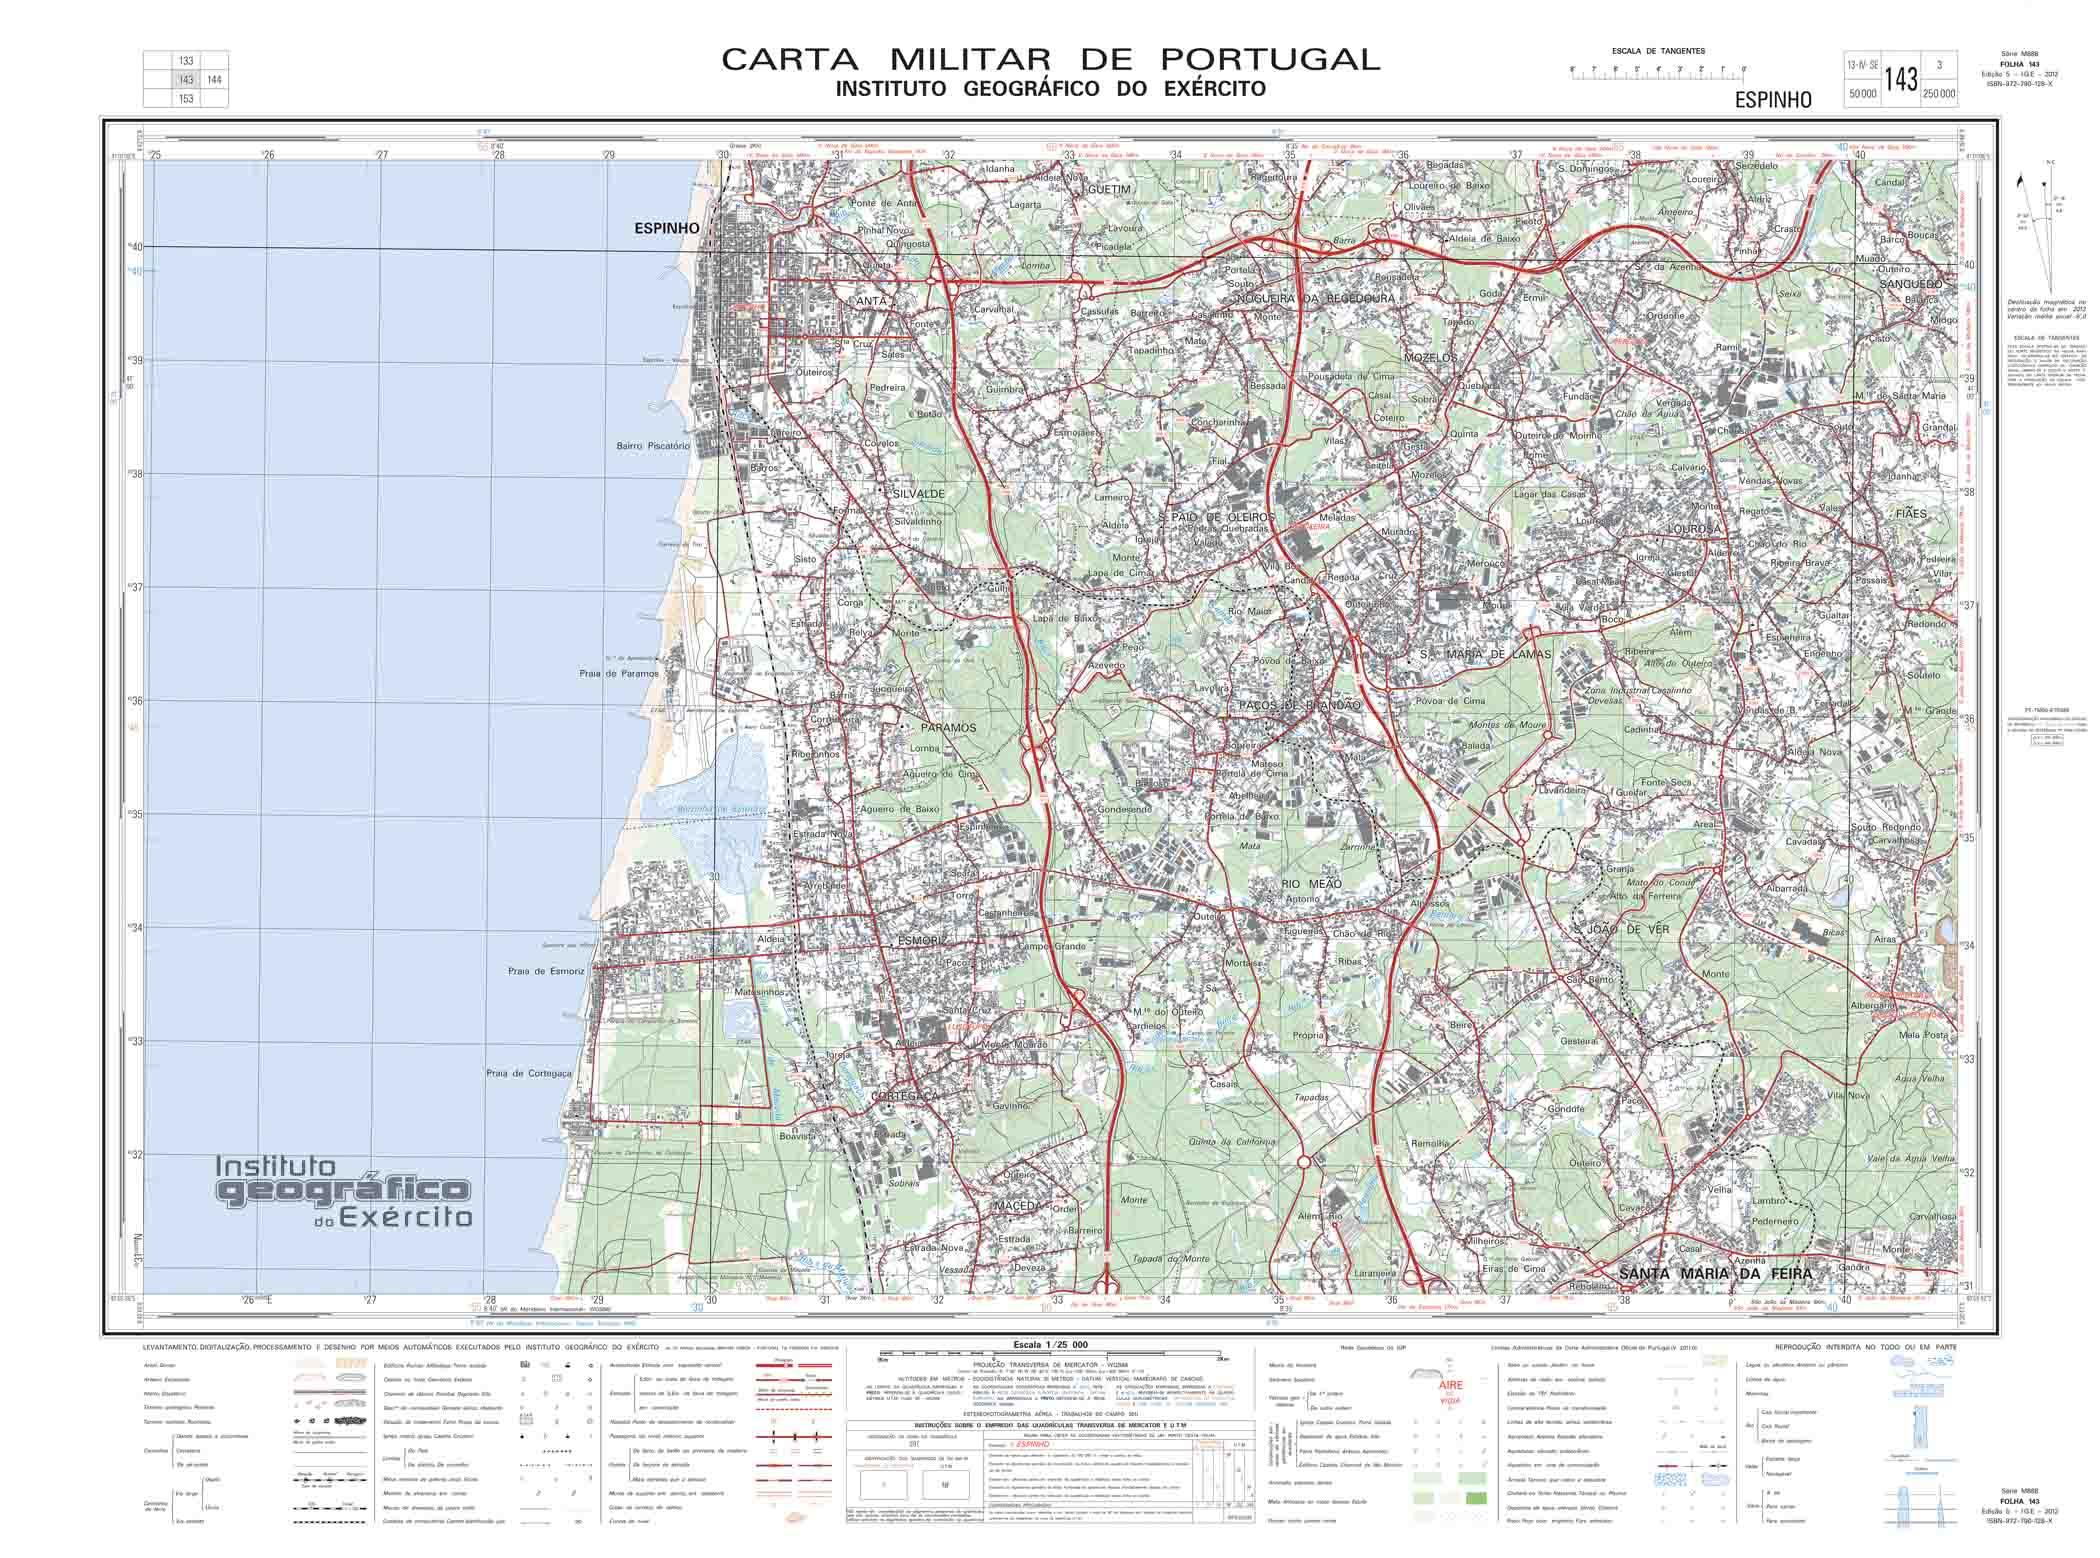 mapa militar portugal GPS CARTAS MILITARES • GeoPT.  Portugal Geocaching and  mapa militar portugal